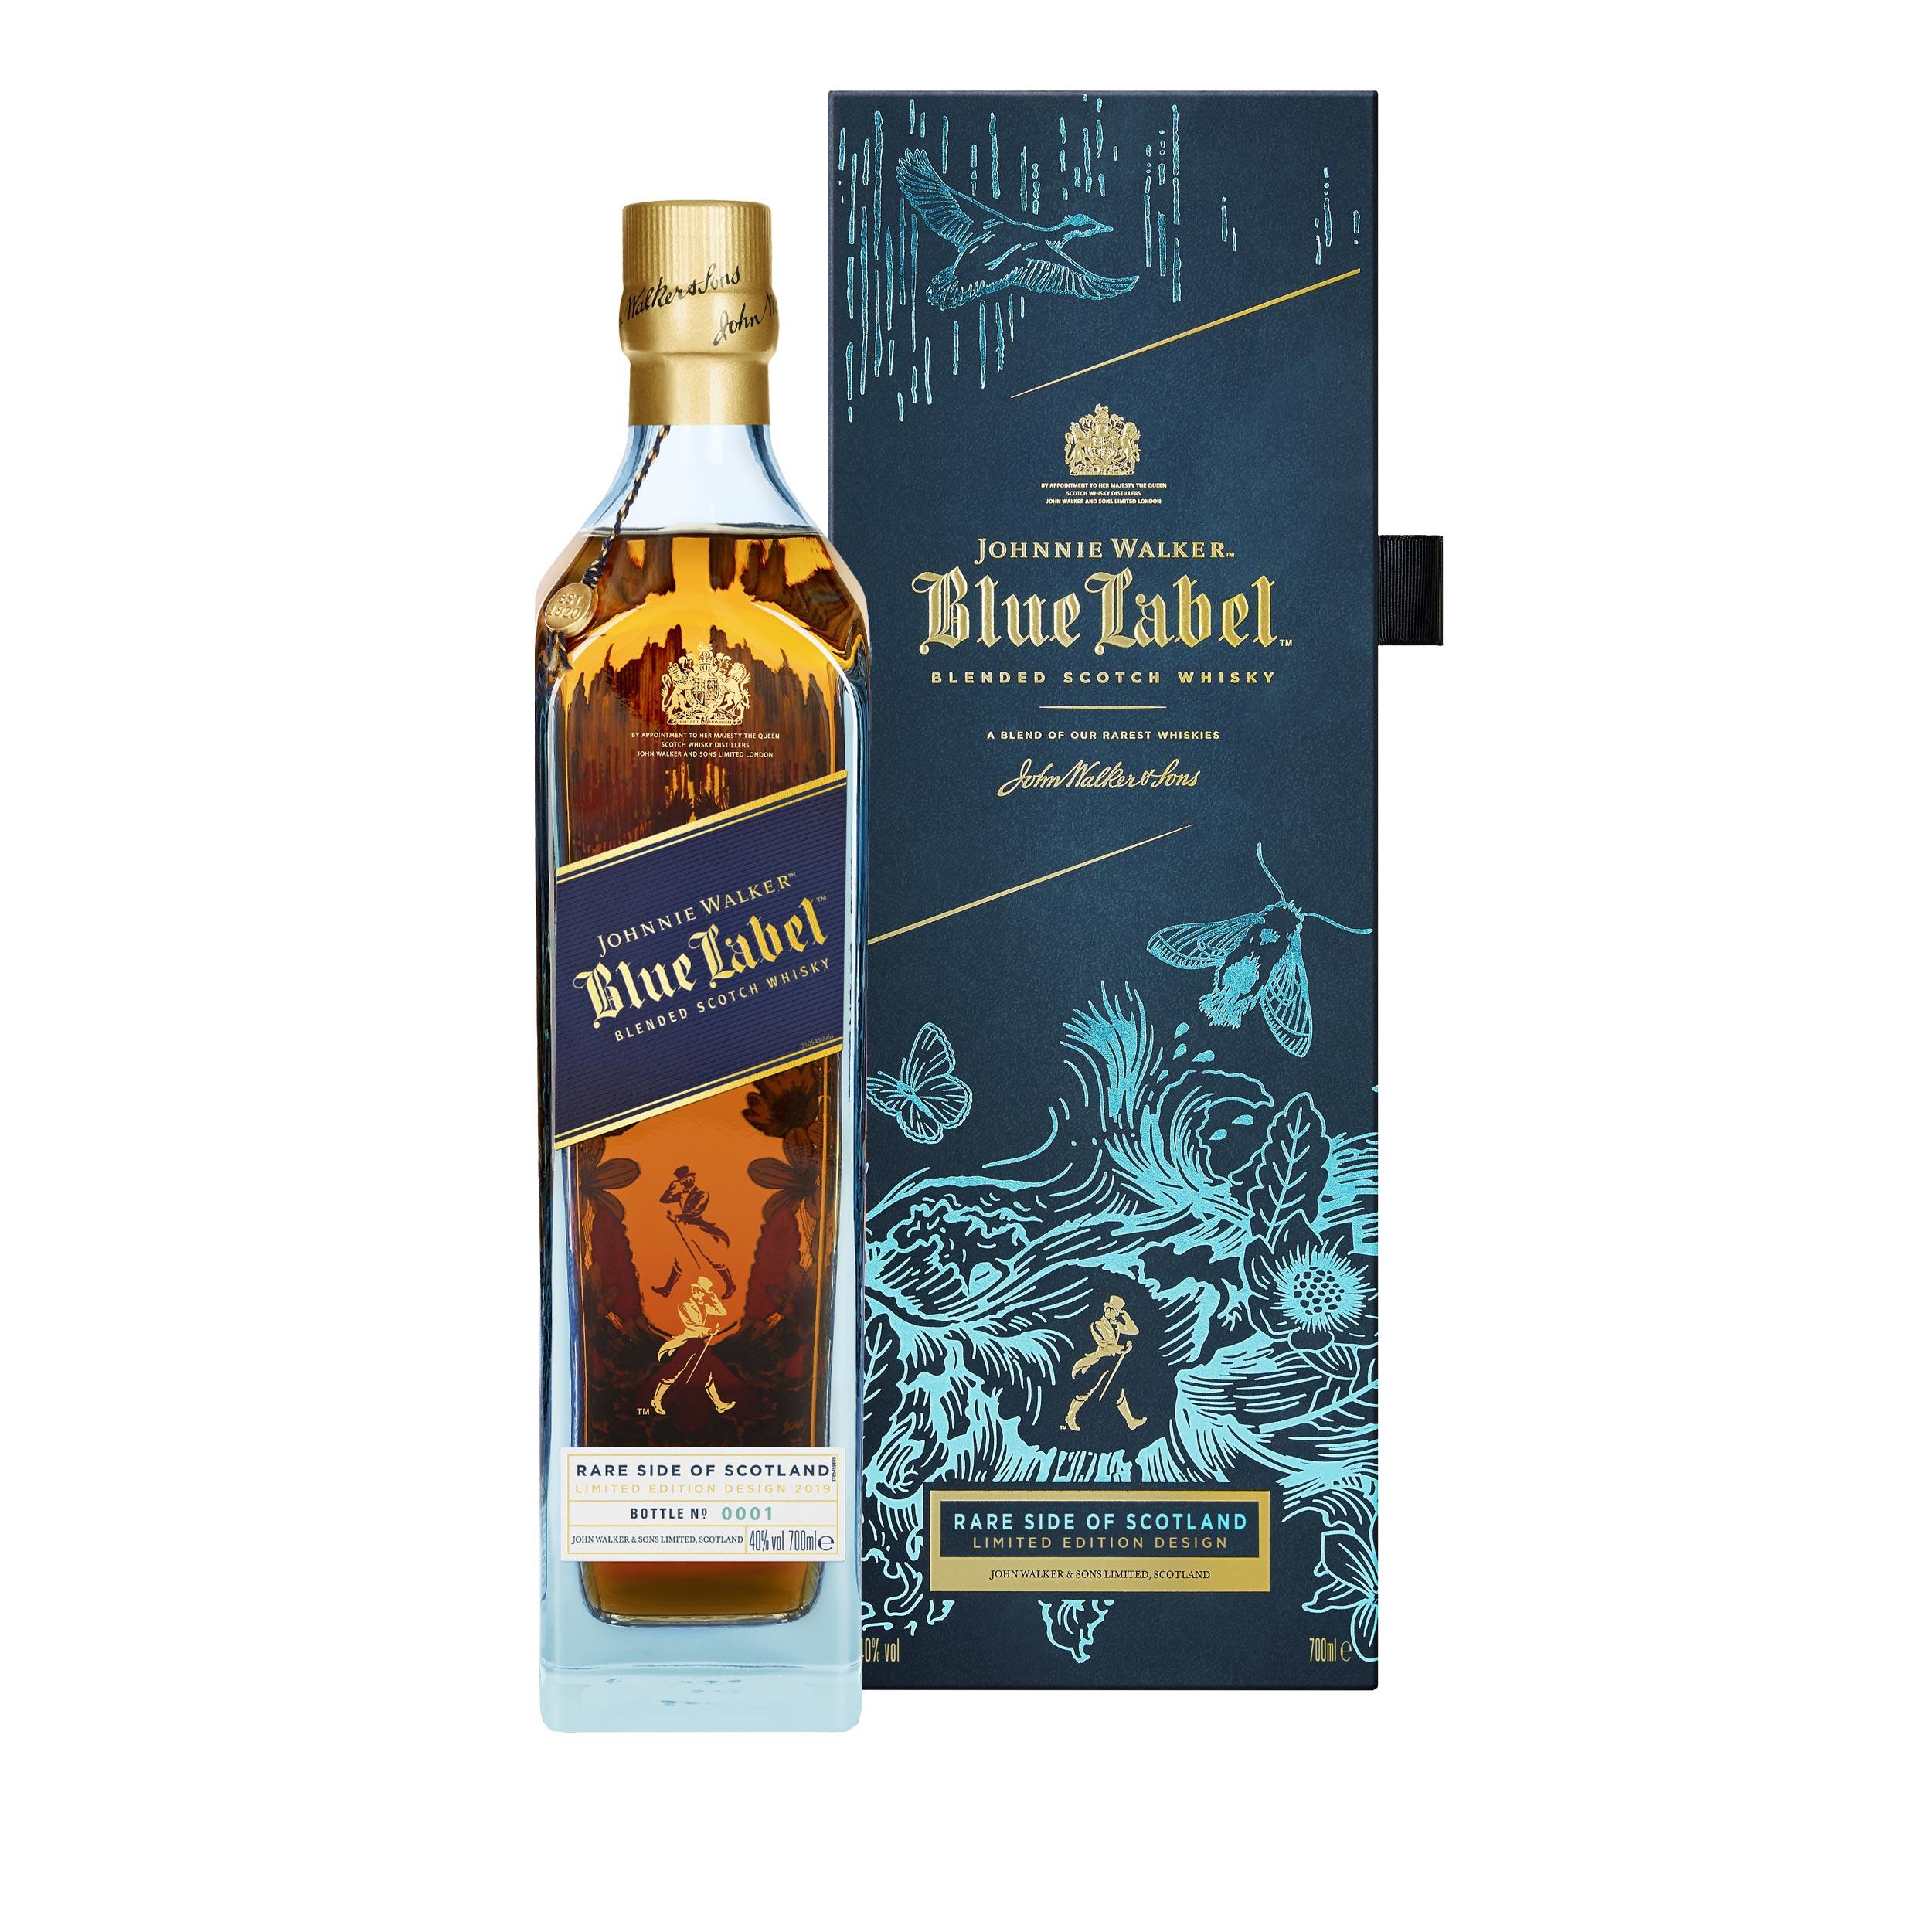 Johnnie Walker Blue Label Rare Side of Scotland